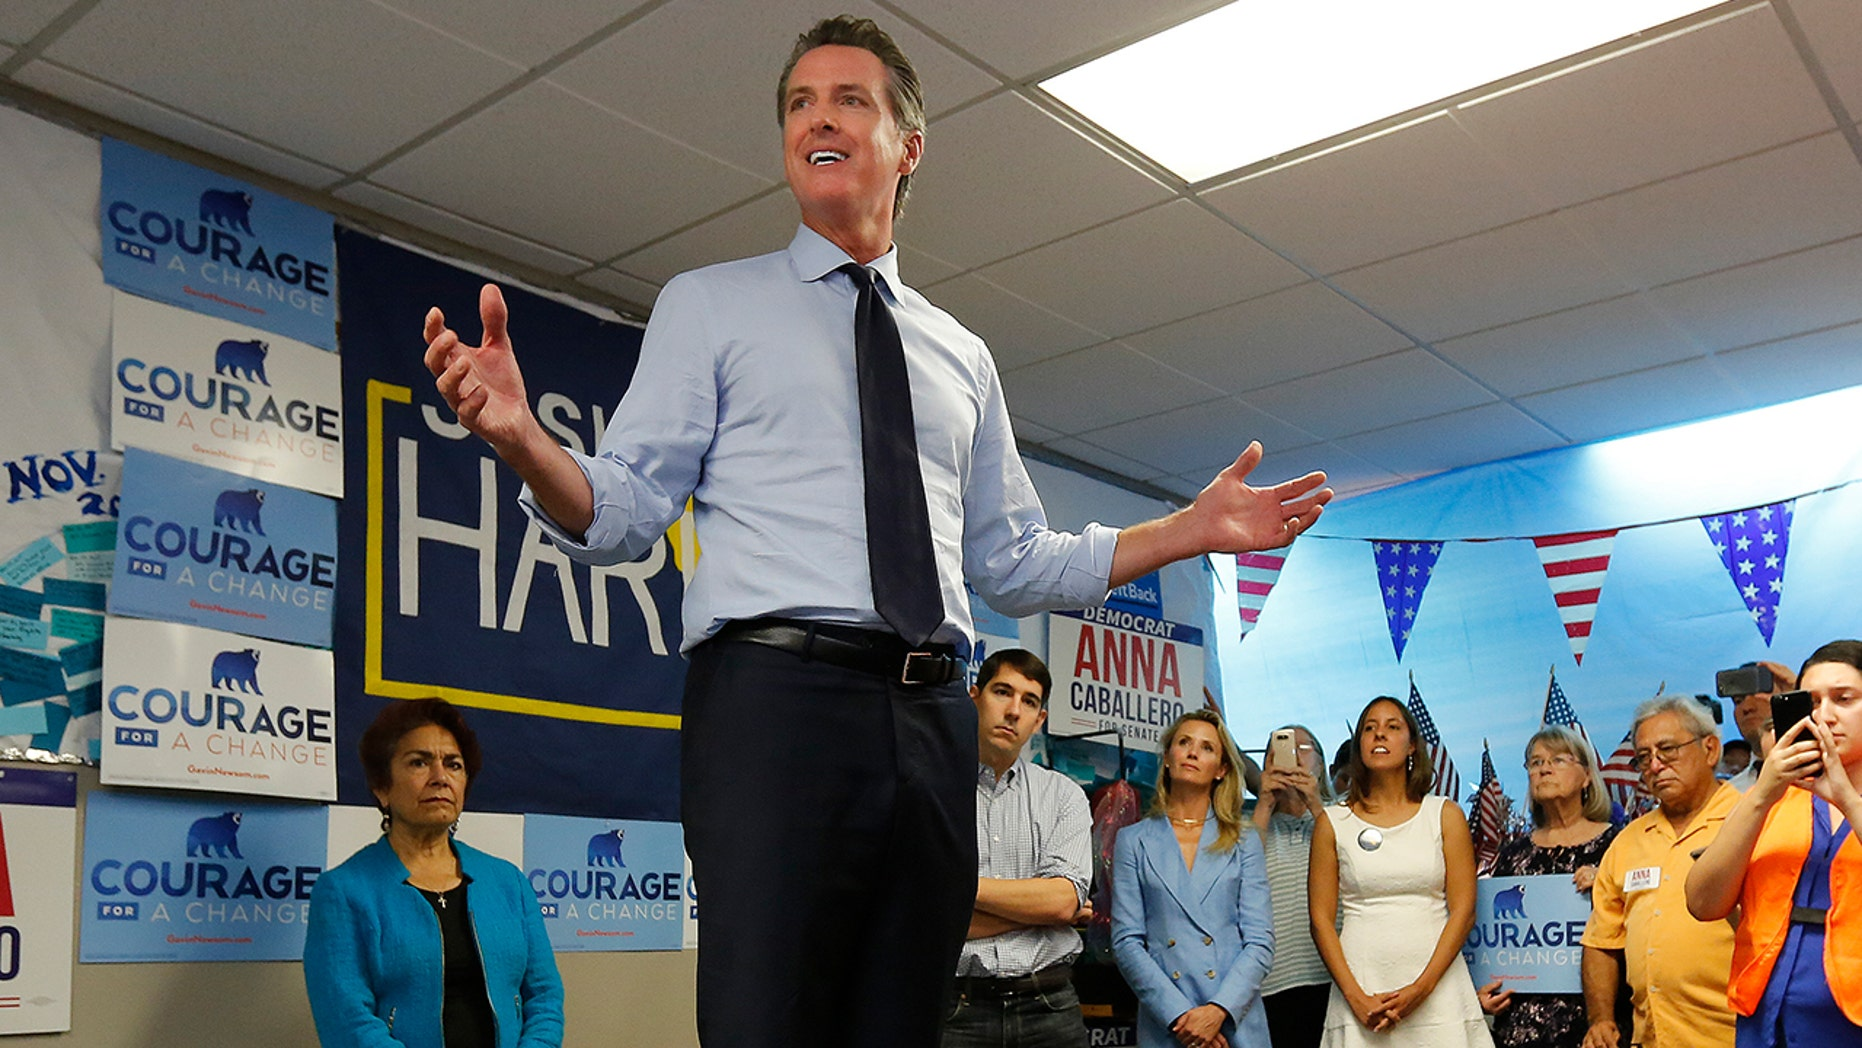 FILE:California gubernatorial candidate. Lt. Gov. Gavin Newsom, a Democrat, addresses supporters during a stop in Modesto, Calif.